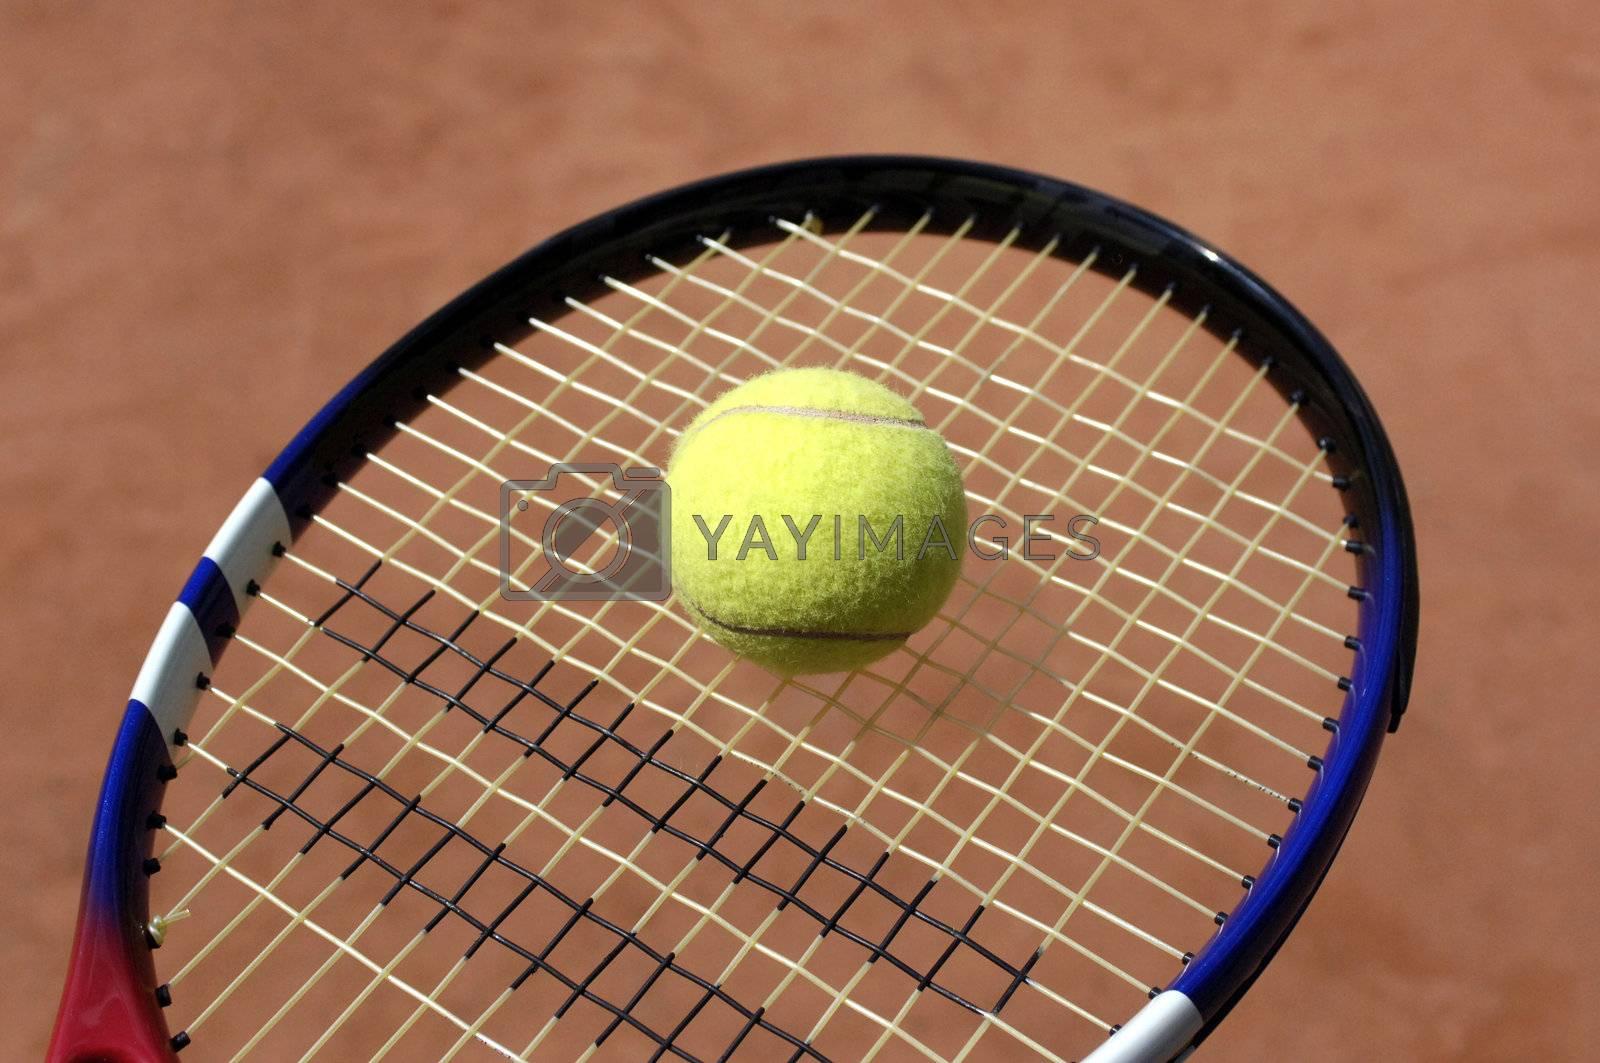 close up of tennis racket